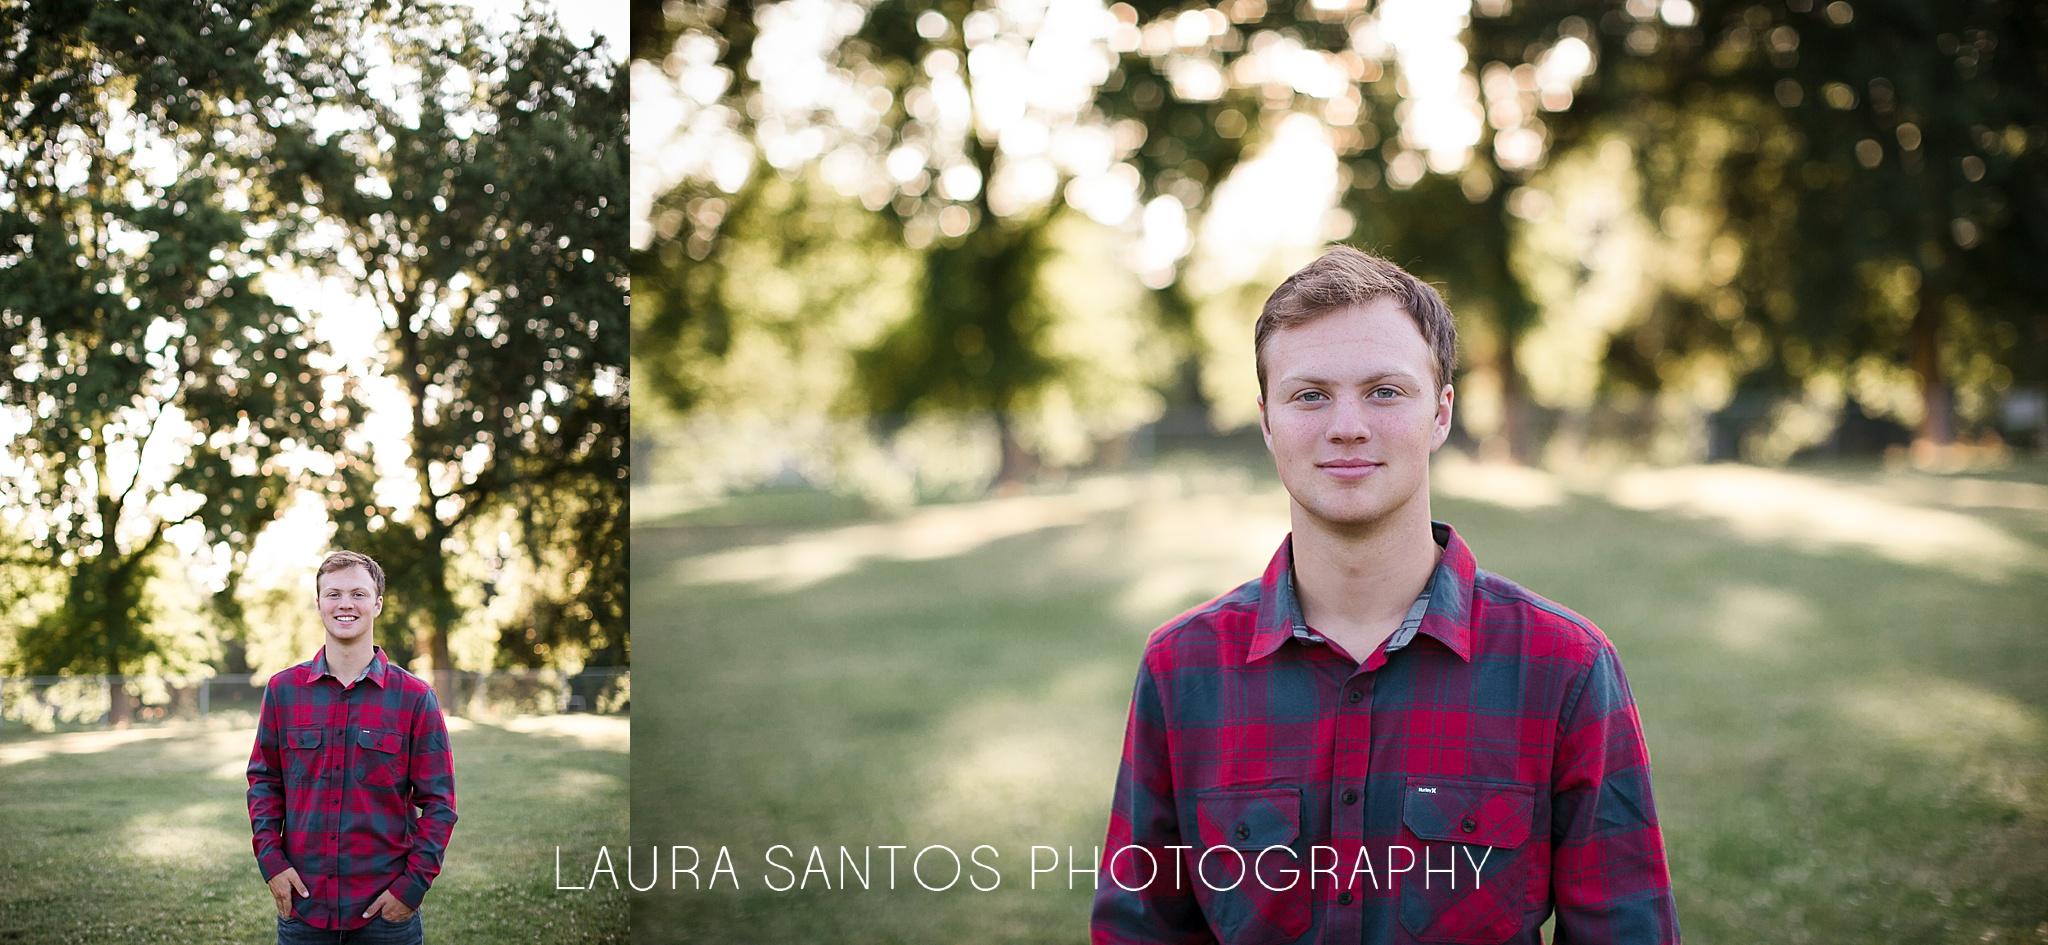 Laura Santos Photography Portland Oregon Family Photographer_1109.jpg